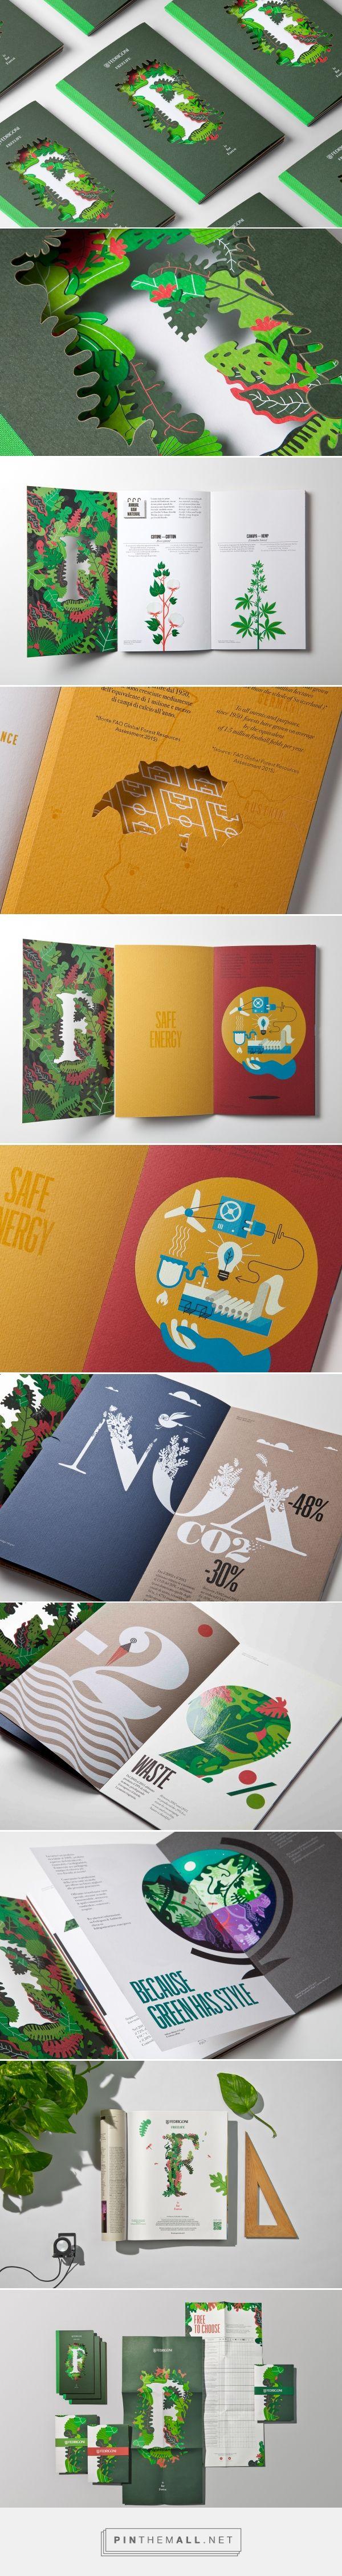 Fedrigoni — Freelife Visual Book on Behance - created on 2016-10-04 14:22:23